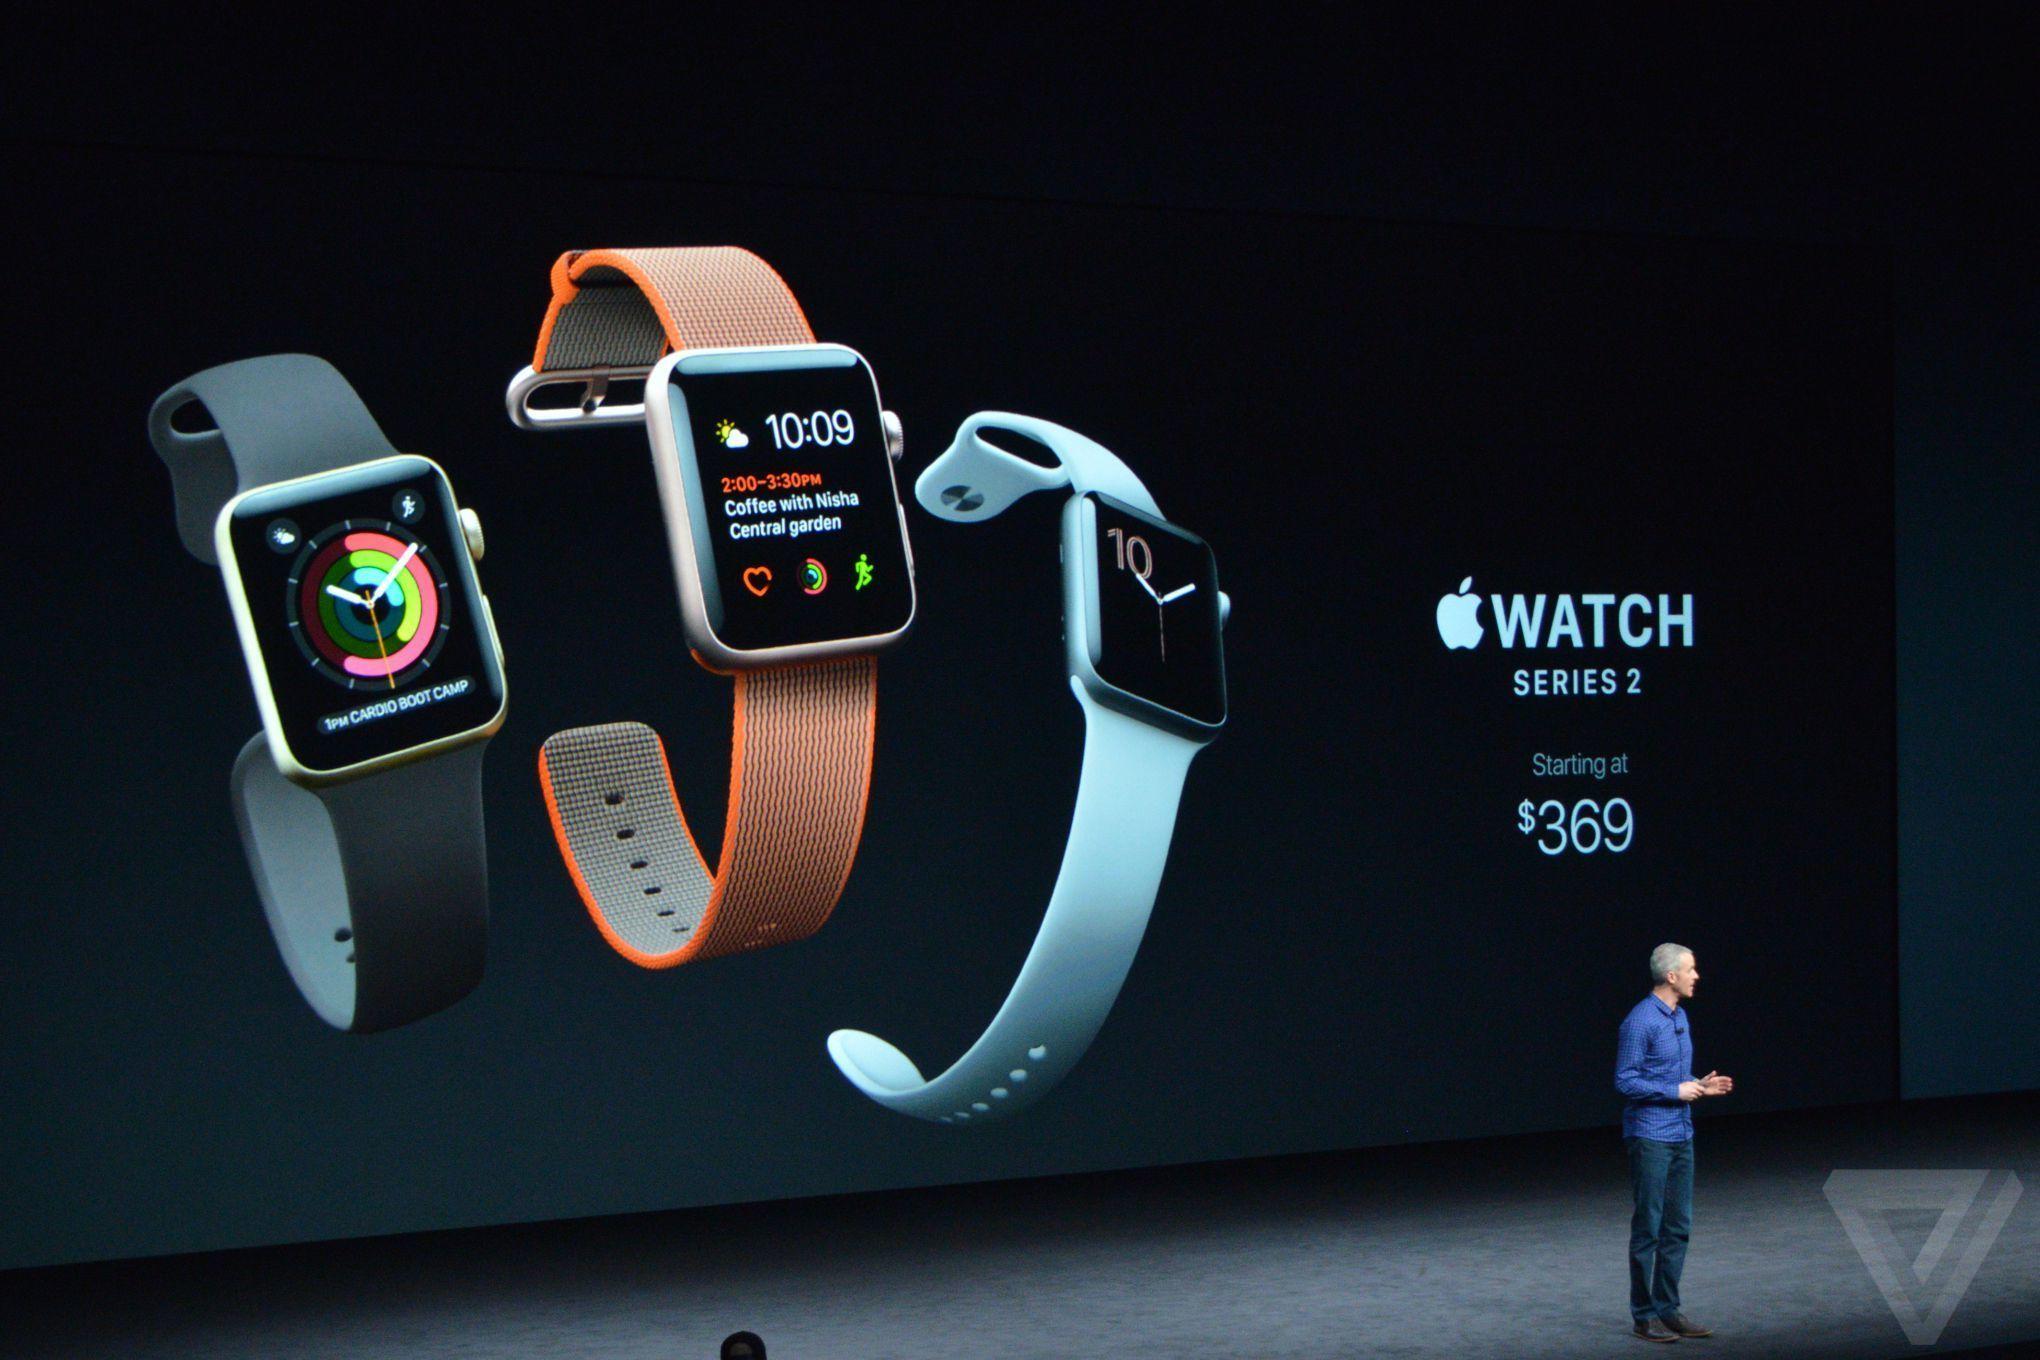 apple-iphone-watch-20160907-4474.JPG